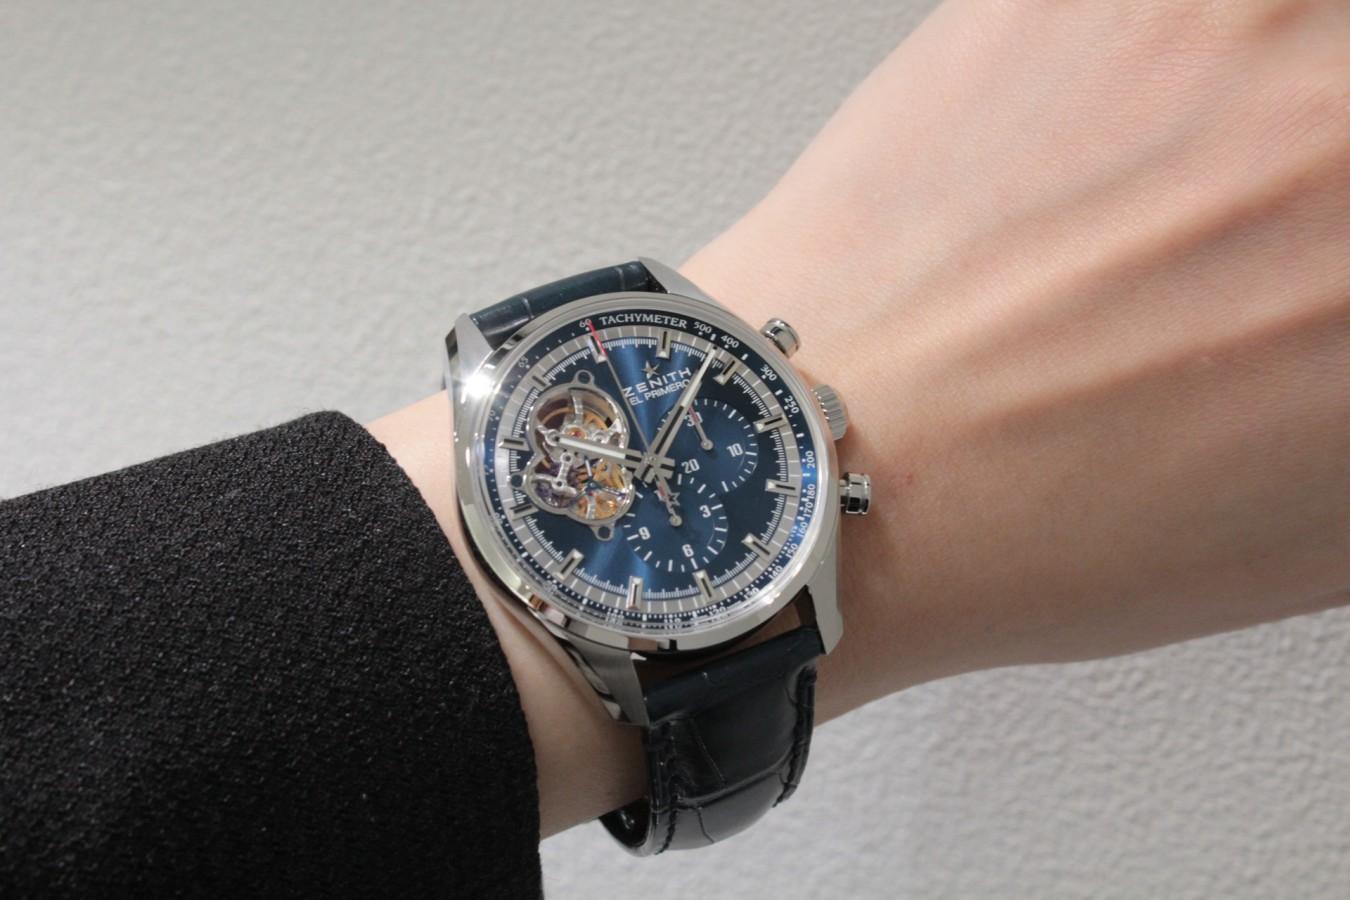 IMG_4274 高級感の漂うブルー文字盤が綺麗な「エル・プリメロ オープン」 - CHRONOMASTER